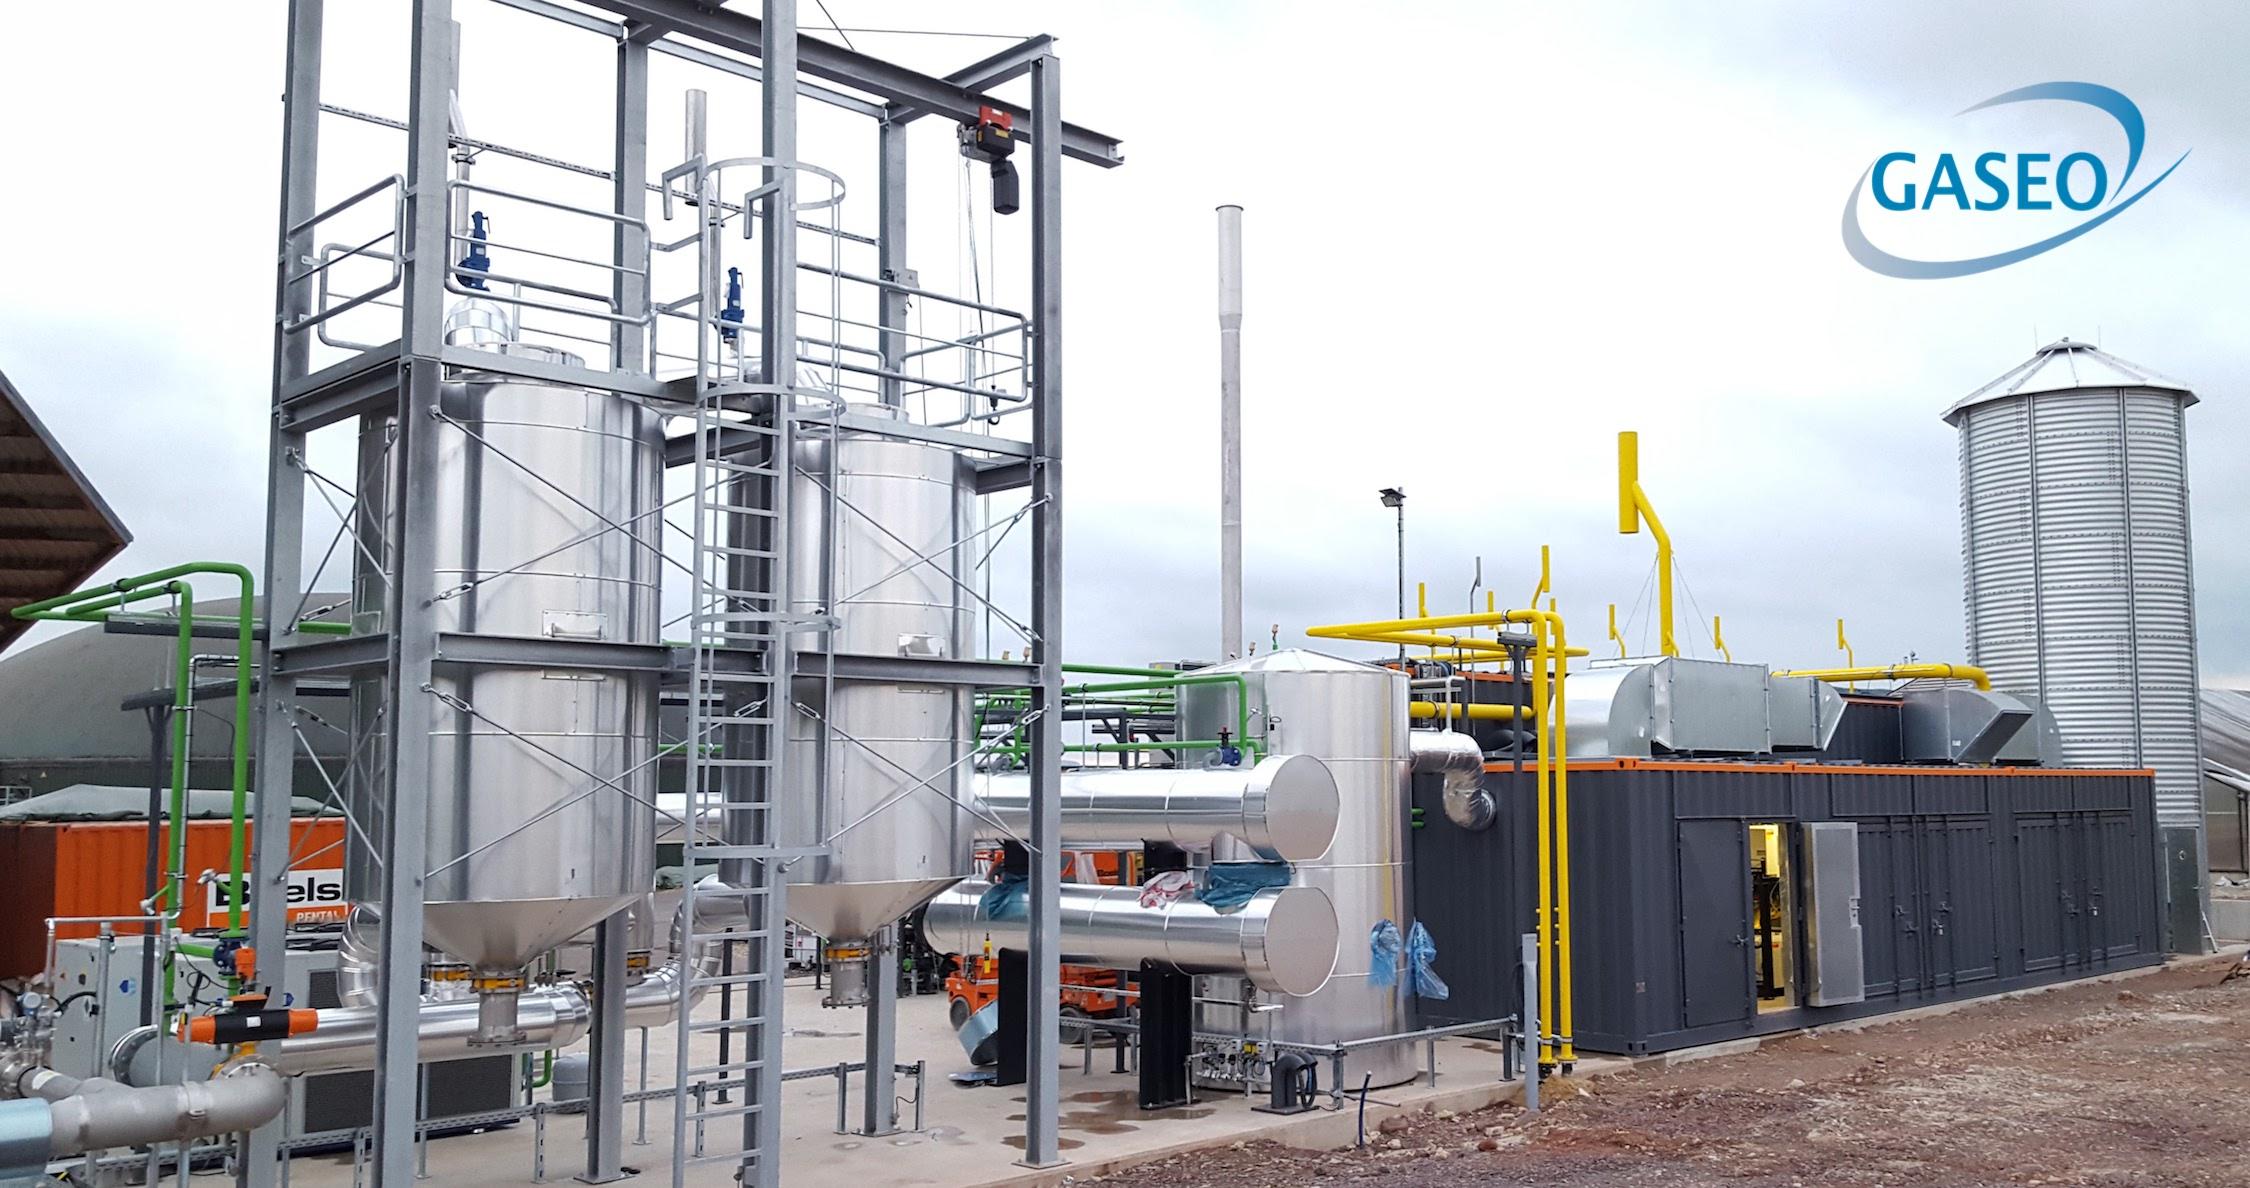 gaseo-biomethane-ensemble-epur-360